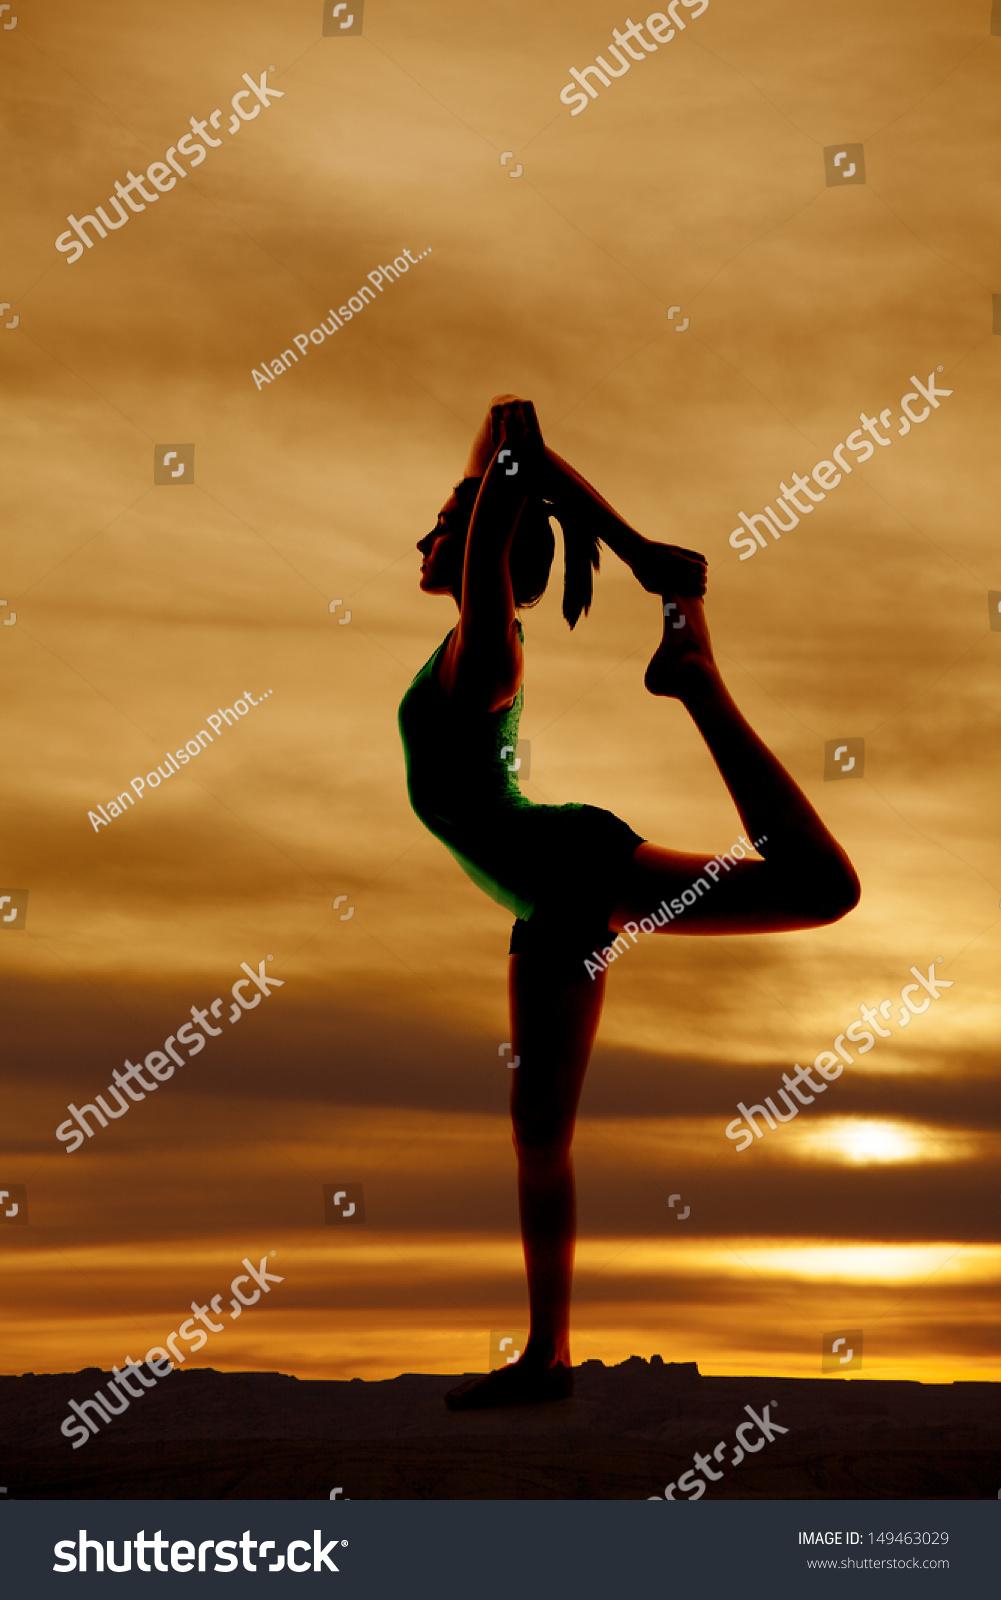 5165b405ac41a Woman Doing Scorpion Pose Silhouette Stock Photo (Edit Now ...